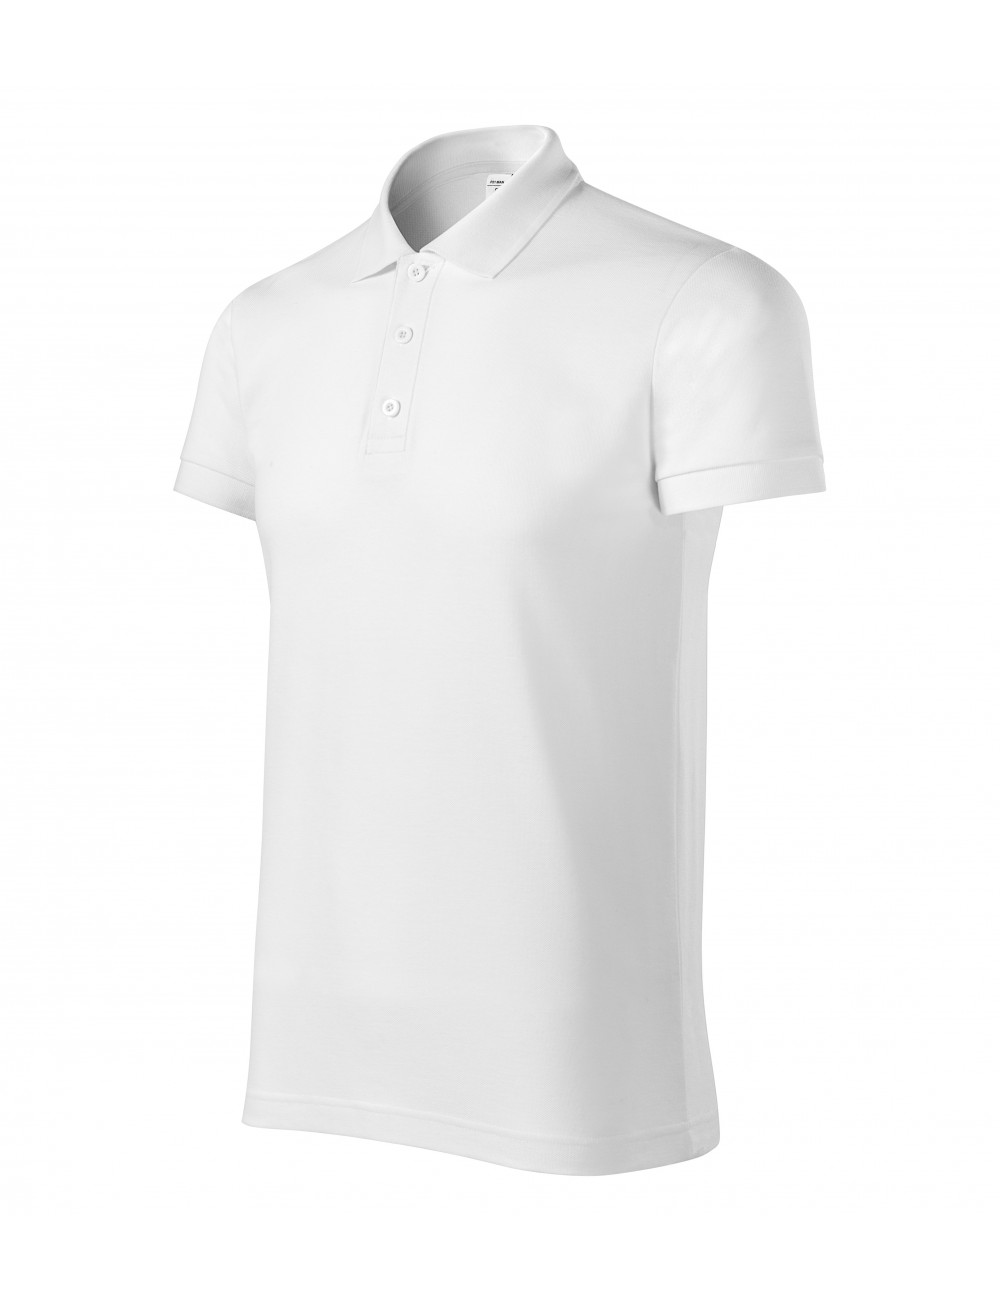 Adler PICCOLIO Koszulka polo męska Joy P21 biały